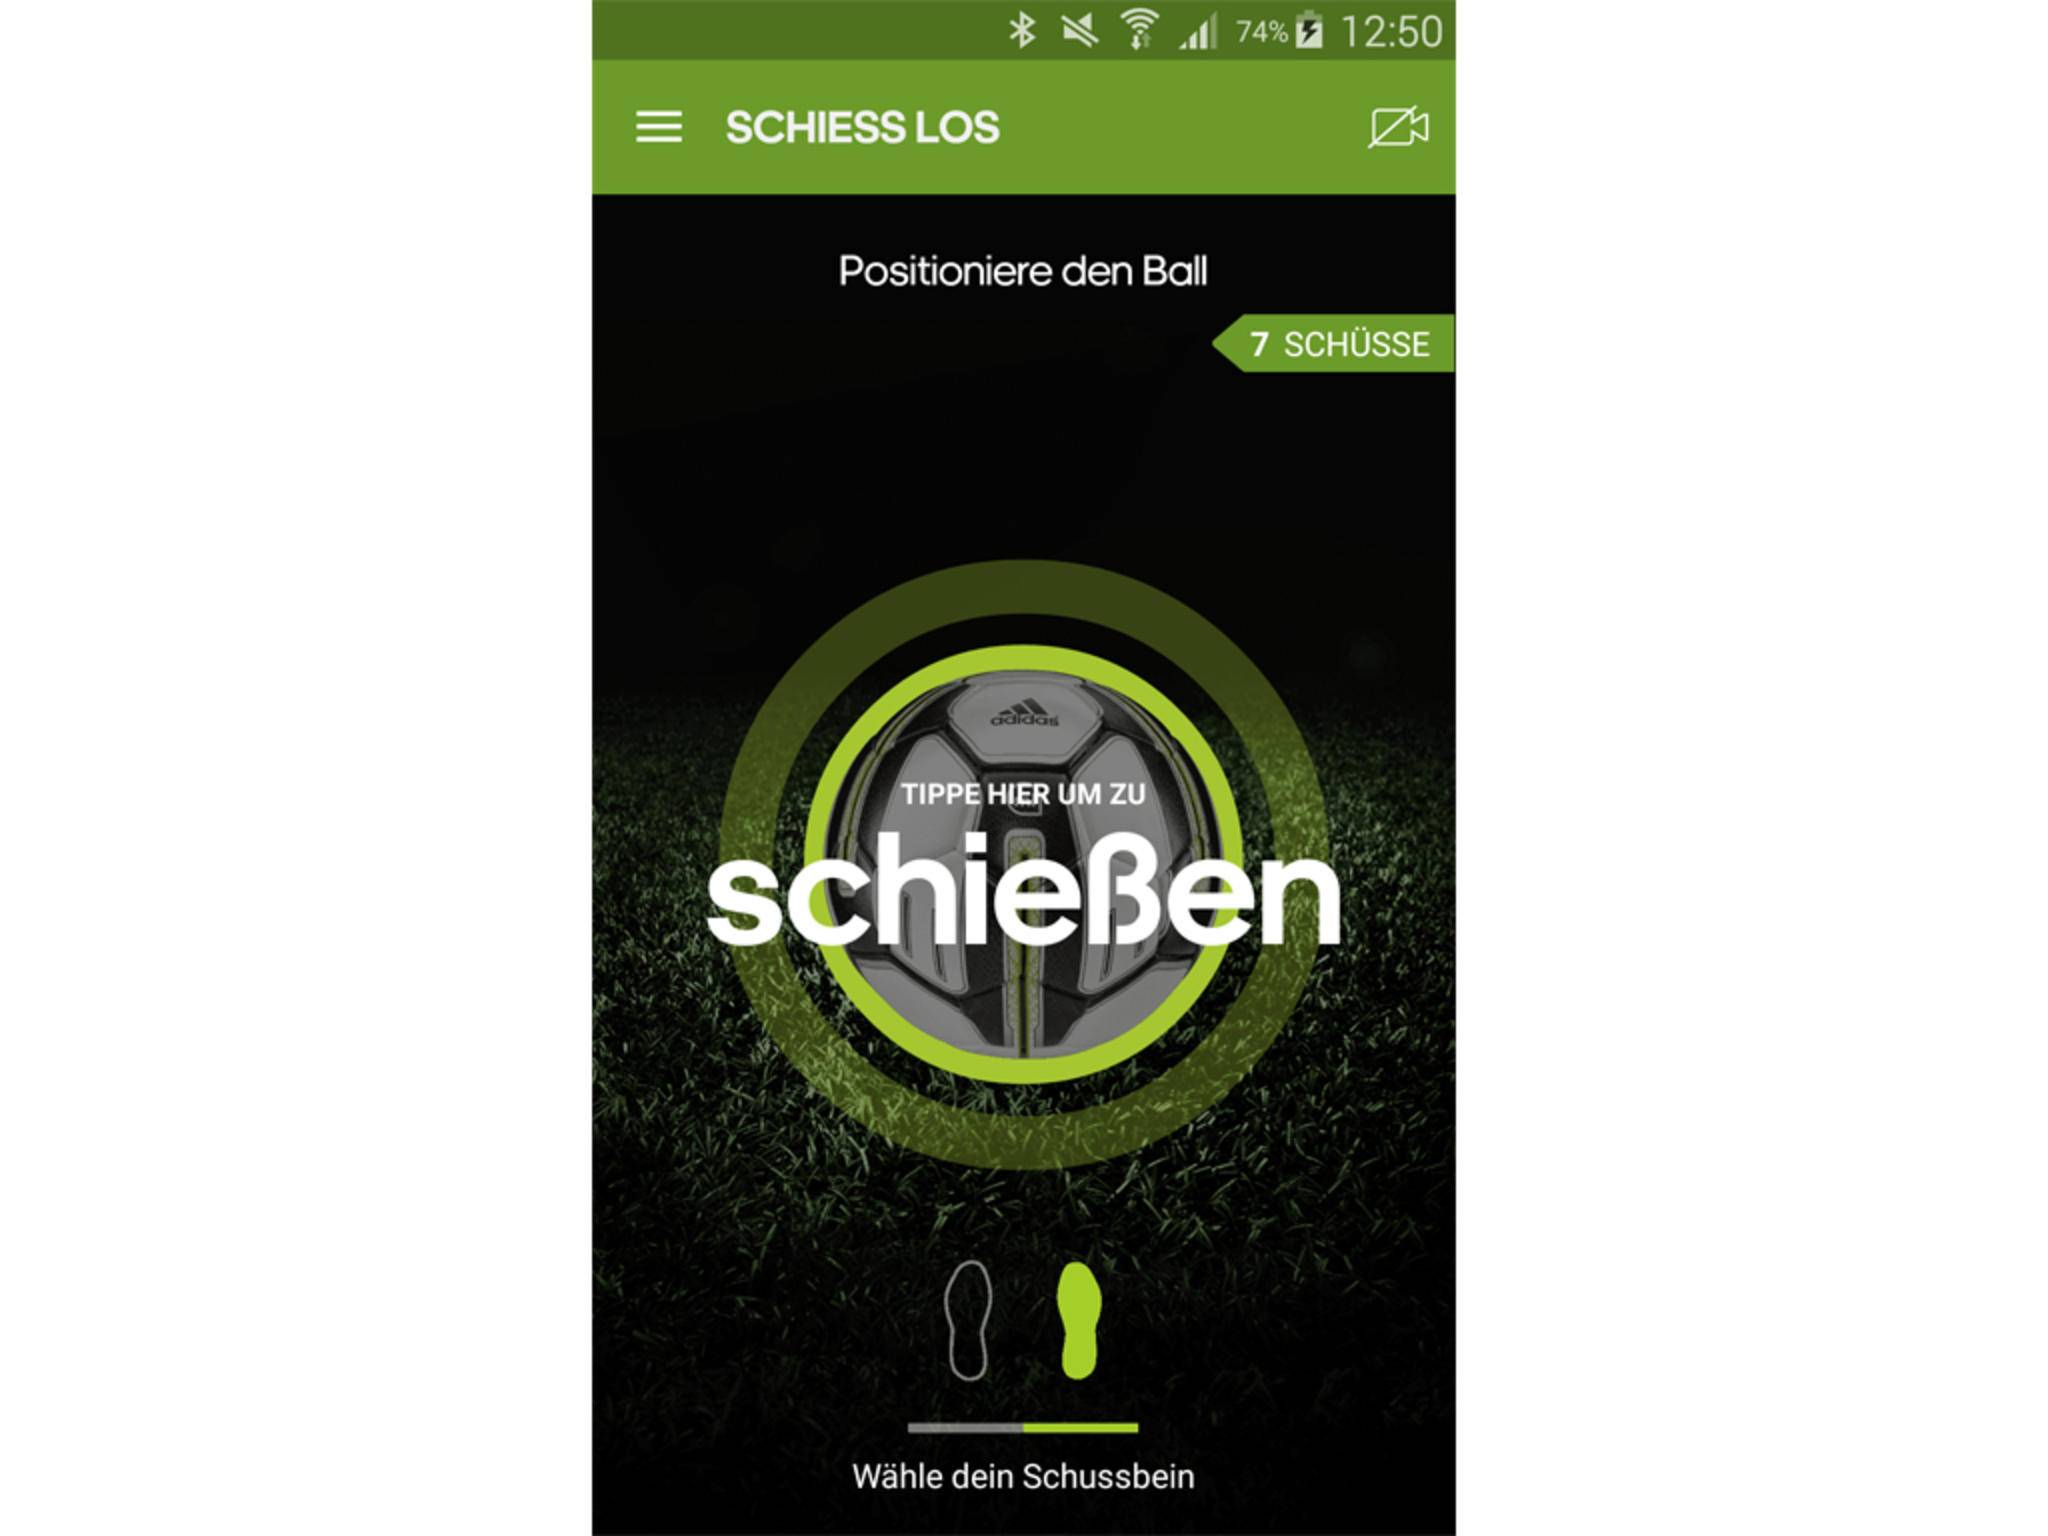 Adidas miCoach Smart Ball App 19